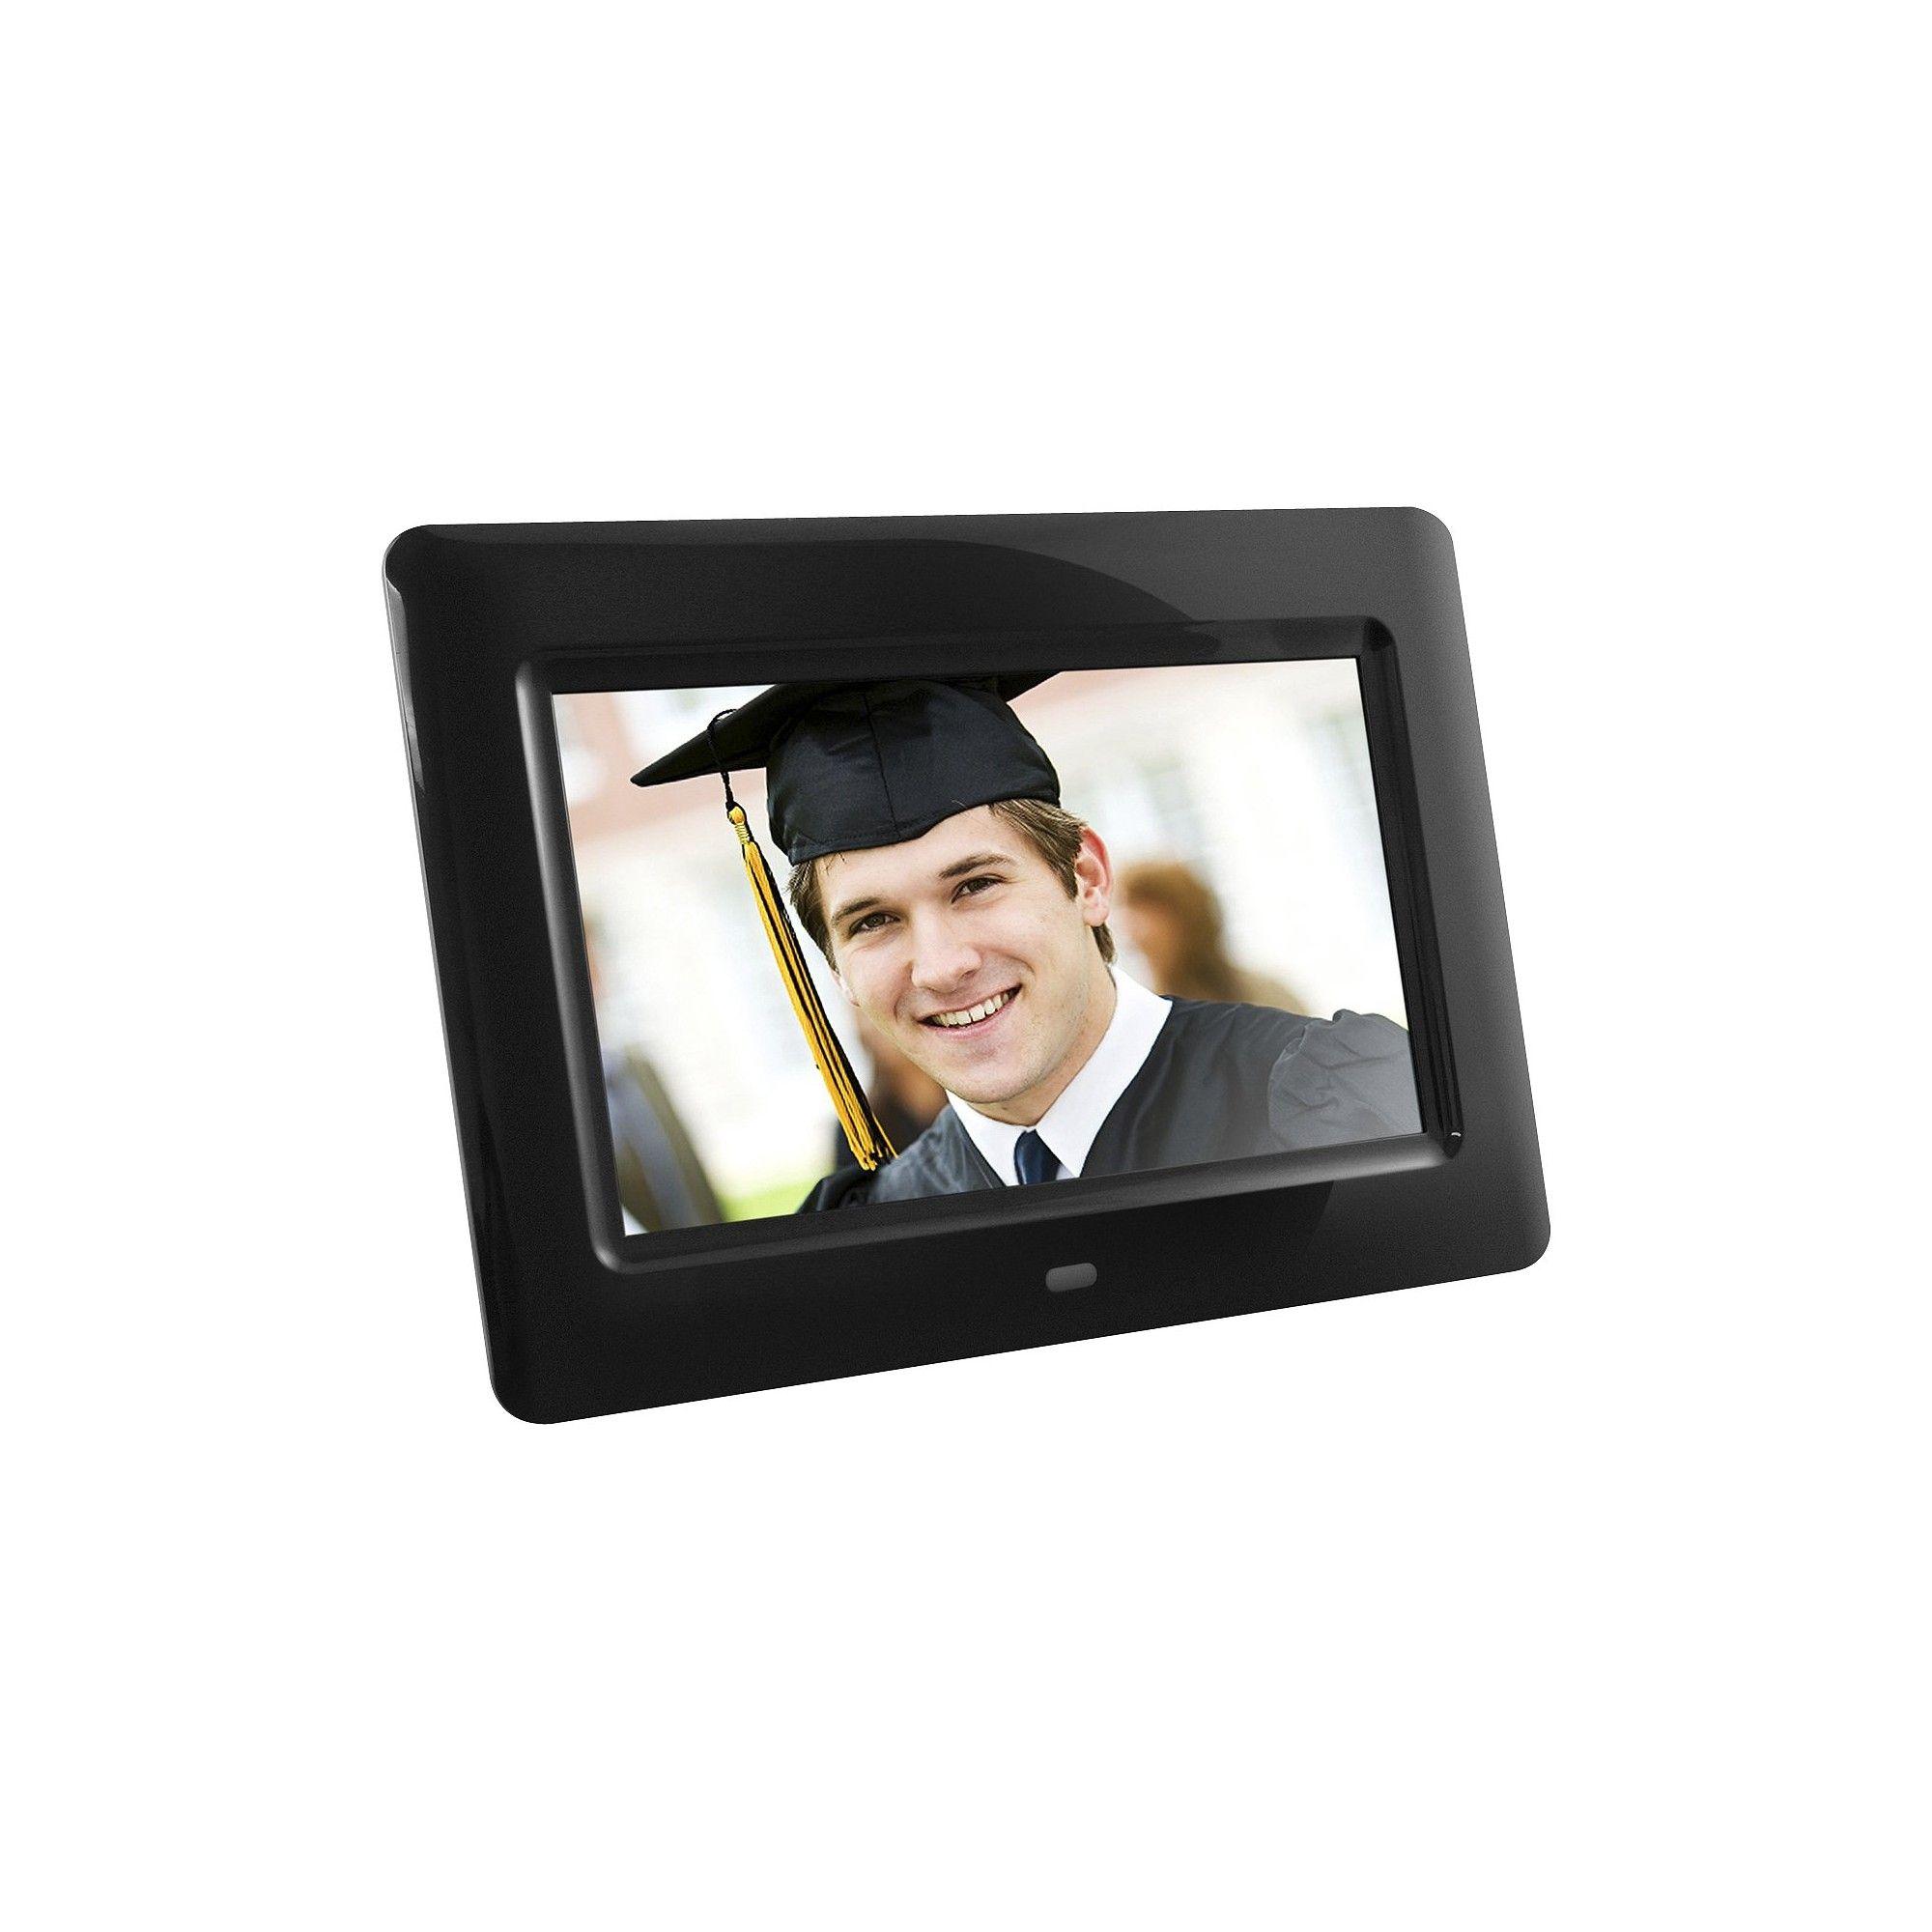 Aluratek 7 Lcd Digital Photo Frame - Black (ADPF07SF) | Digital ...